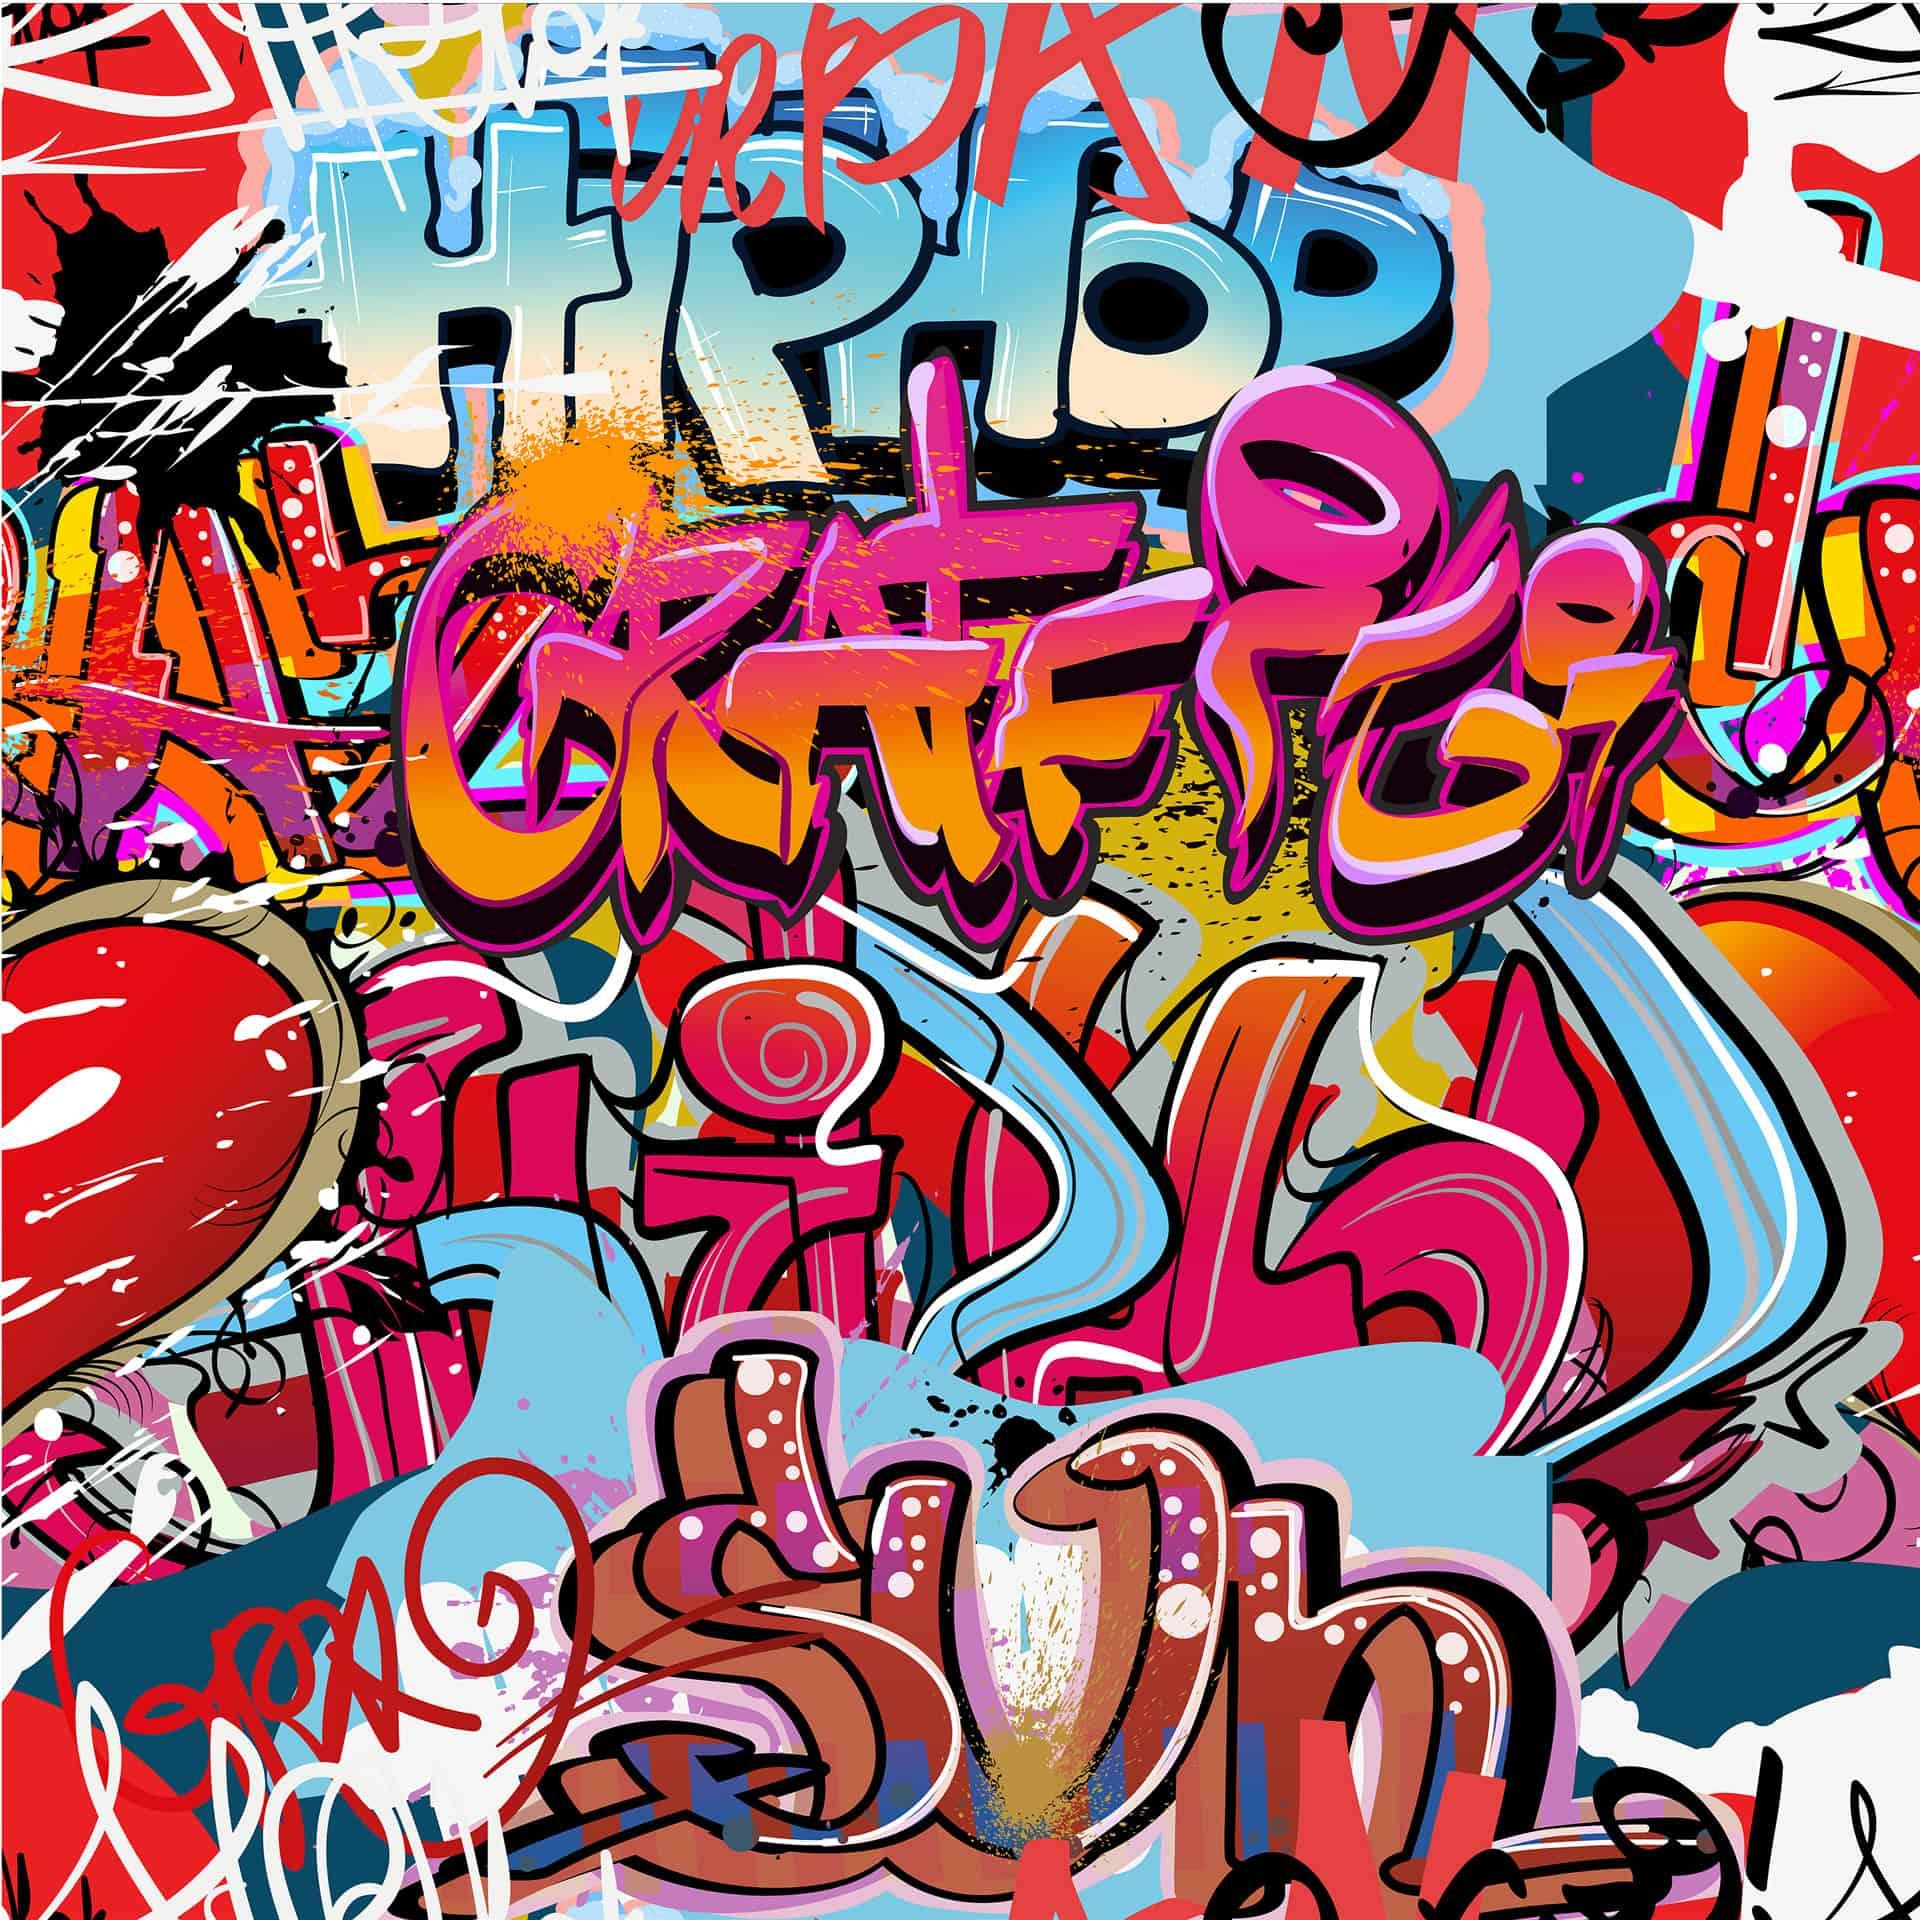 Fototapete graffiti hip hop von k l wall art wall - Wandsticker graffiti ...